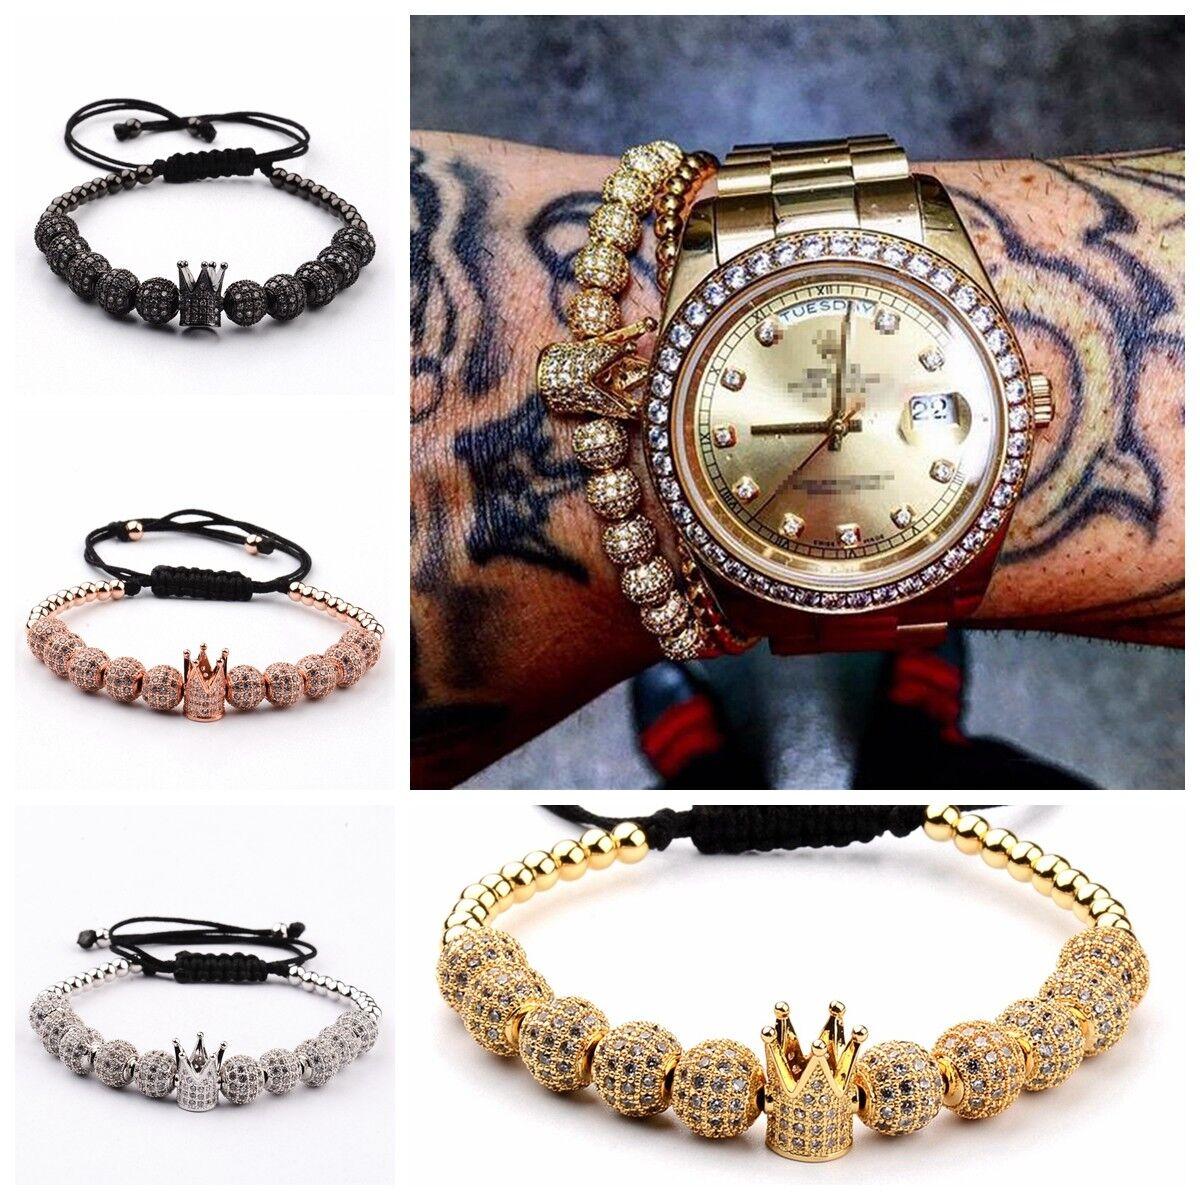 DouVei 1 Crown 10 Pieces zircon Balls Hand-Woven Men's 4MM Copper Beads Bracelet